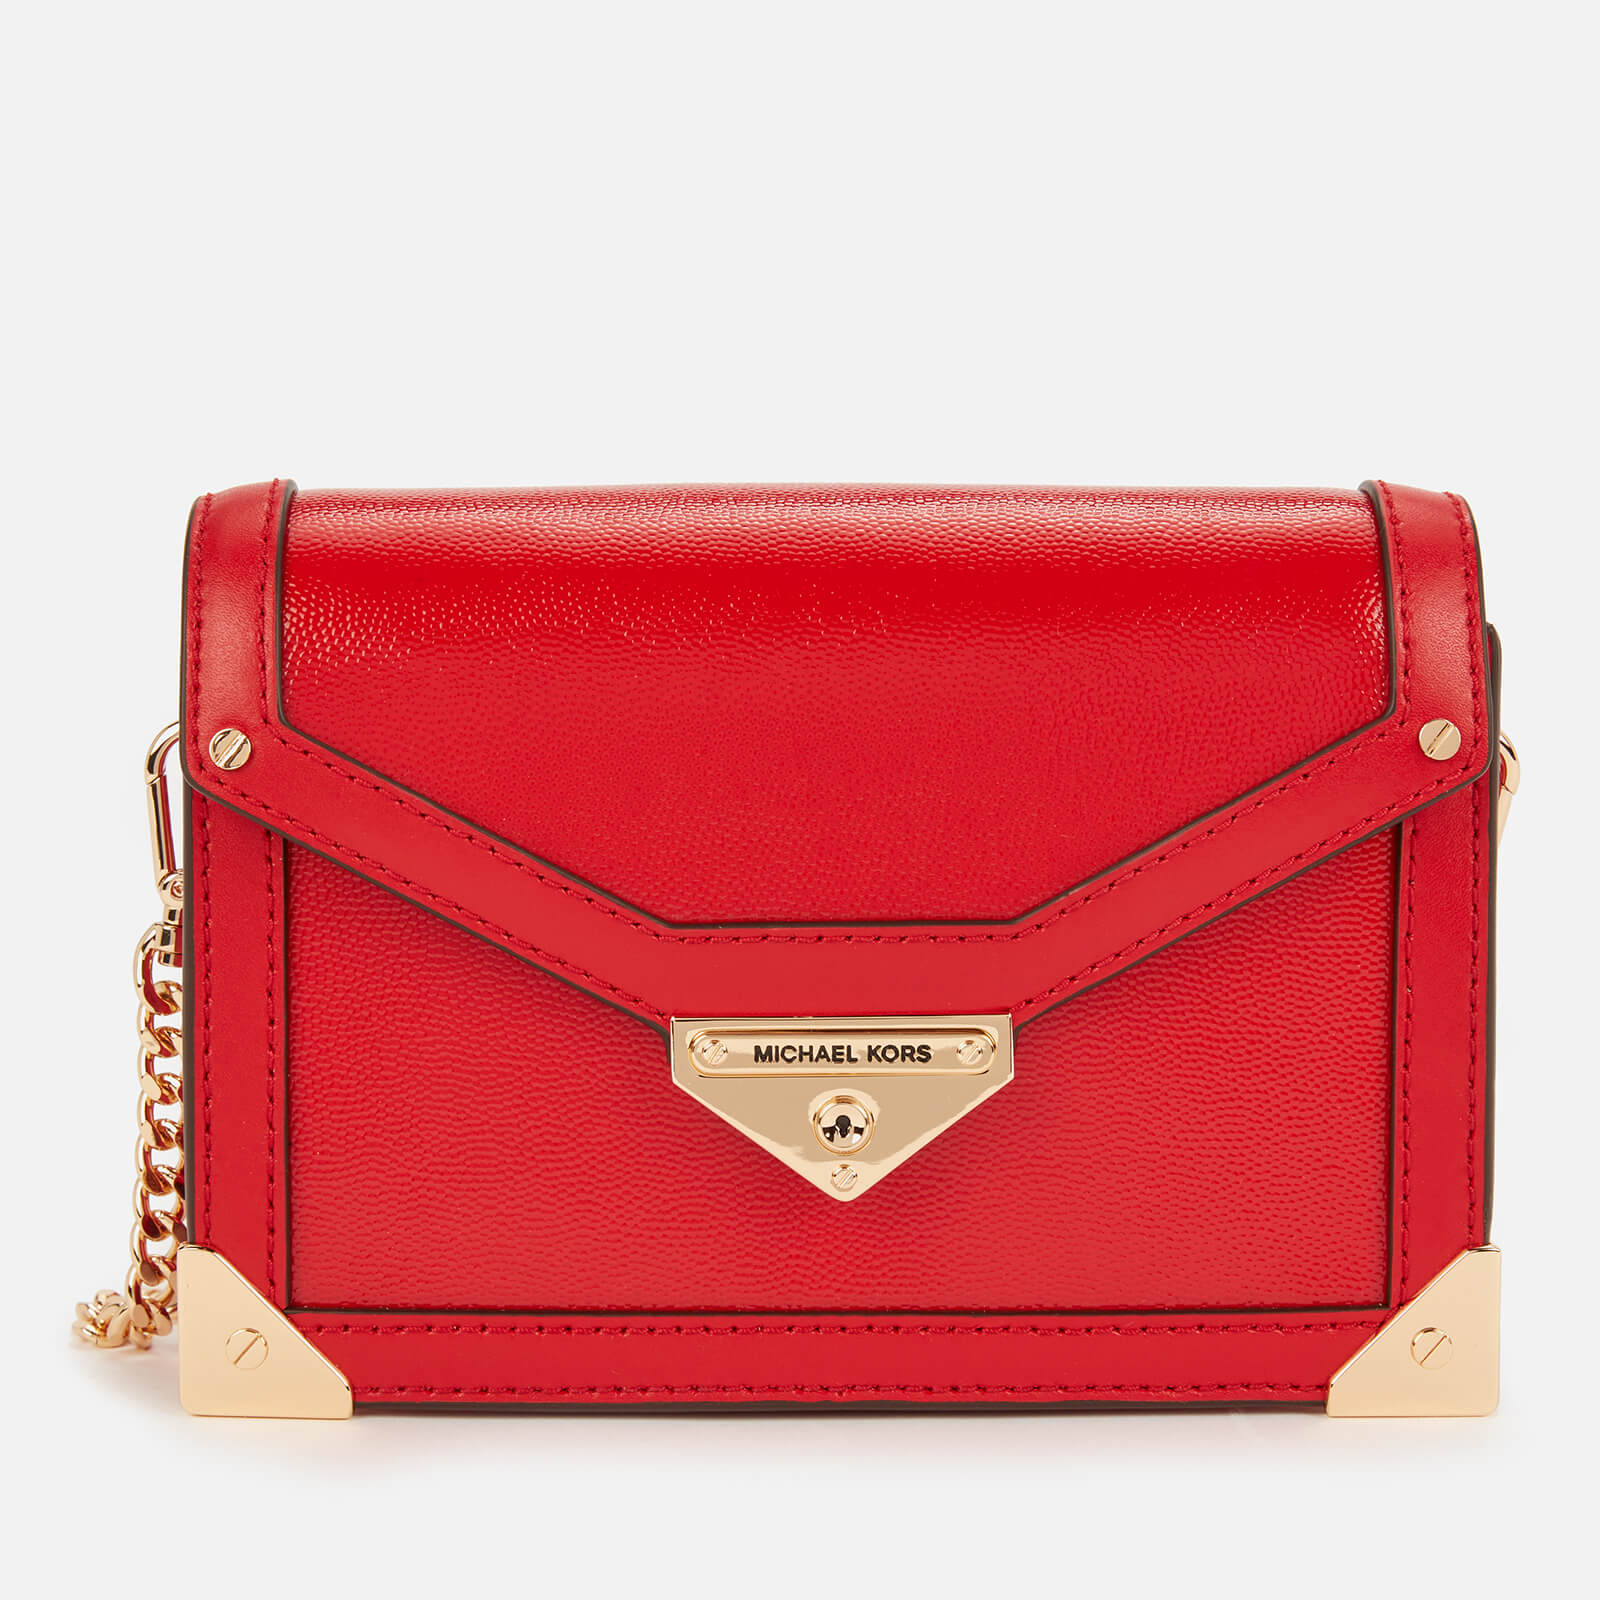 Michael Michael Kors Women's Grace Small Trunk Cross Body Bag - Bright Red